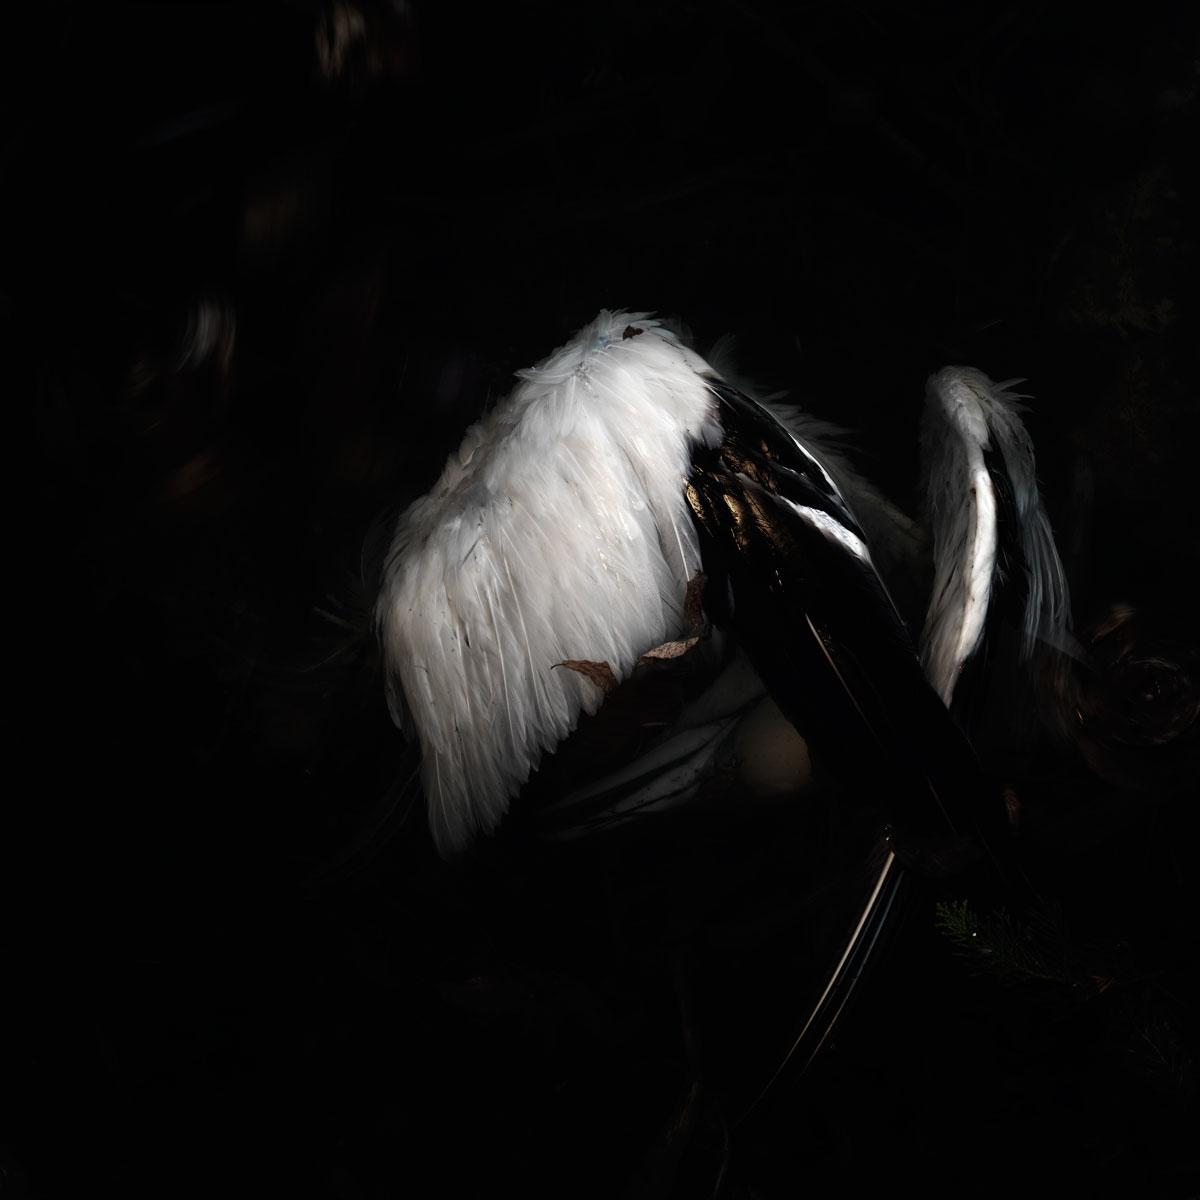 Bird no 21